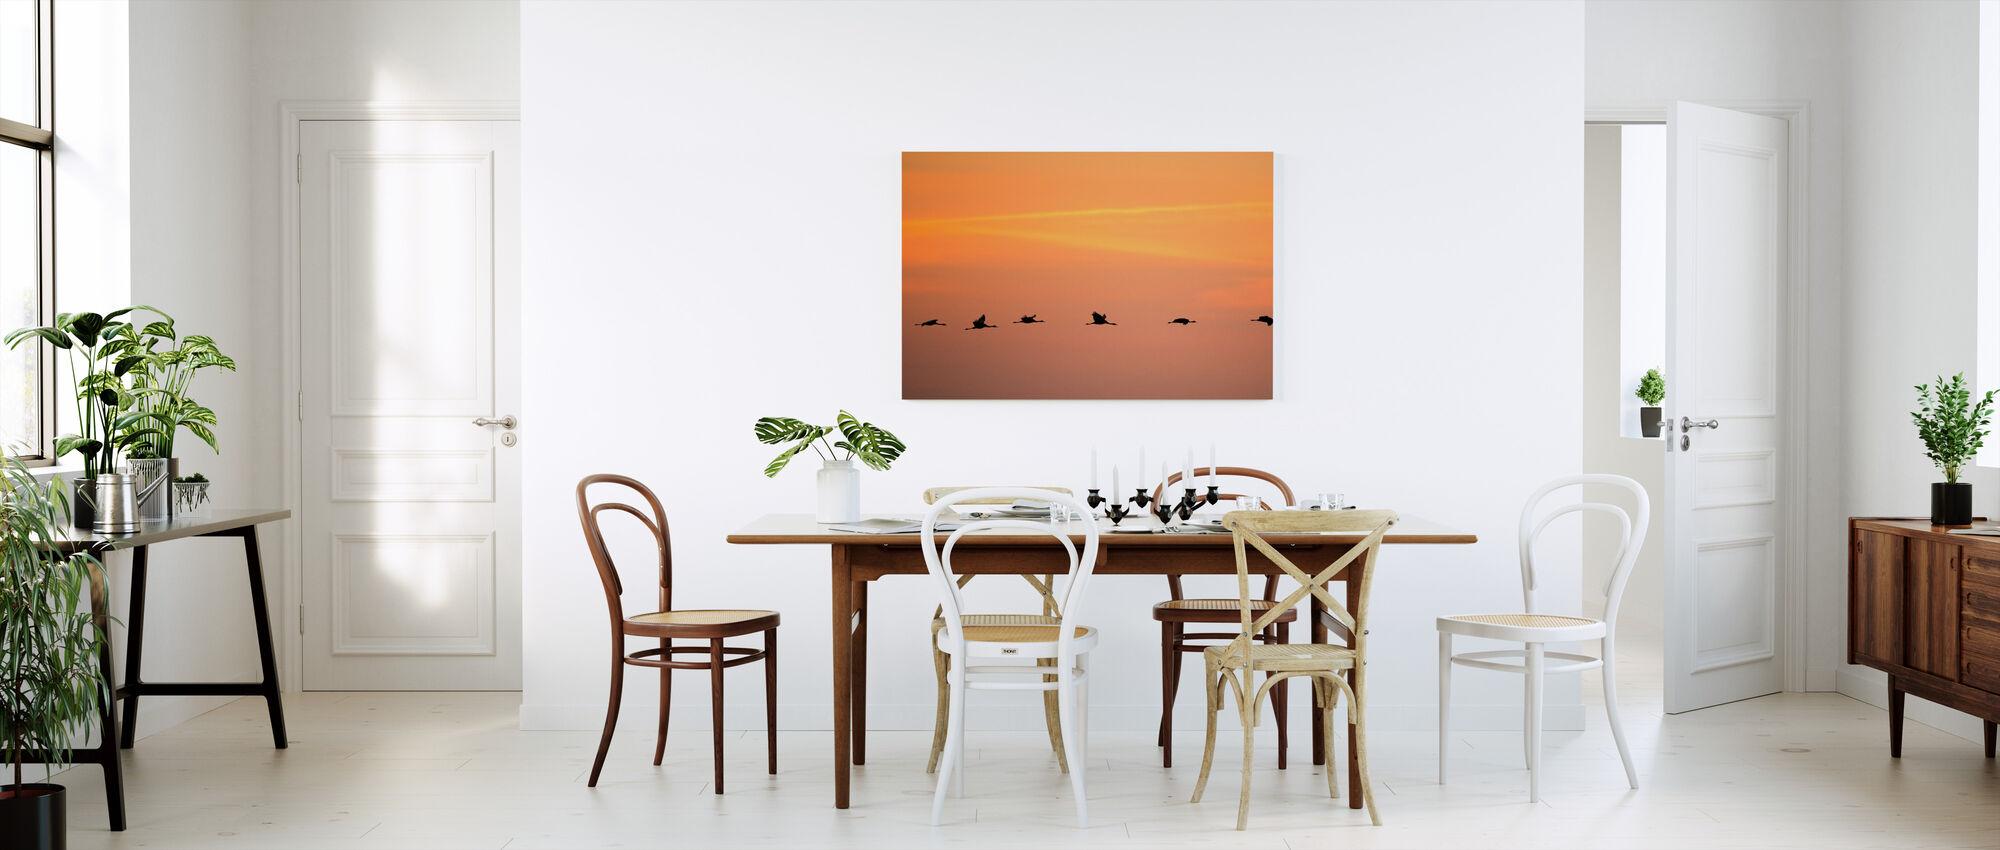 Cranes in Sunrise - Canvas print - Kitchen